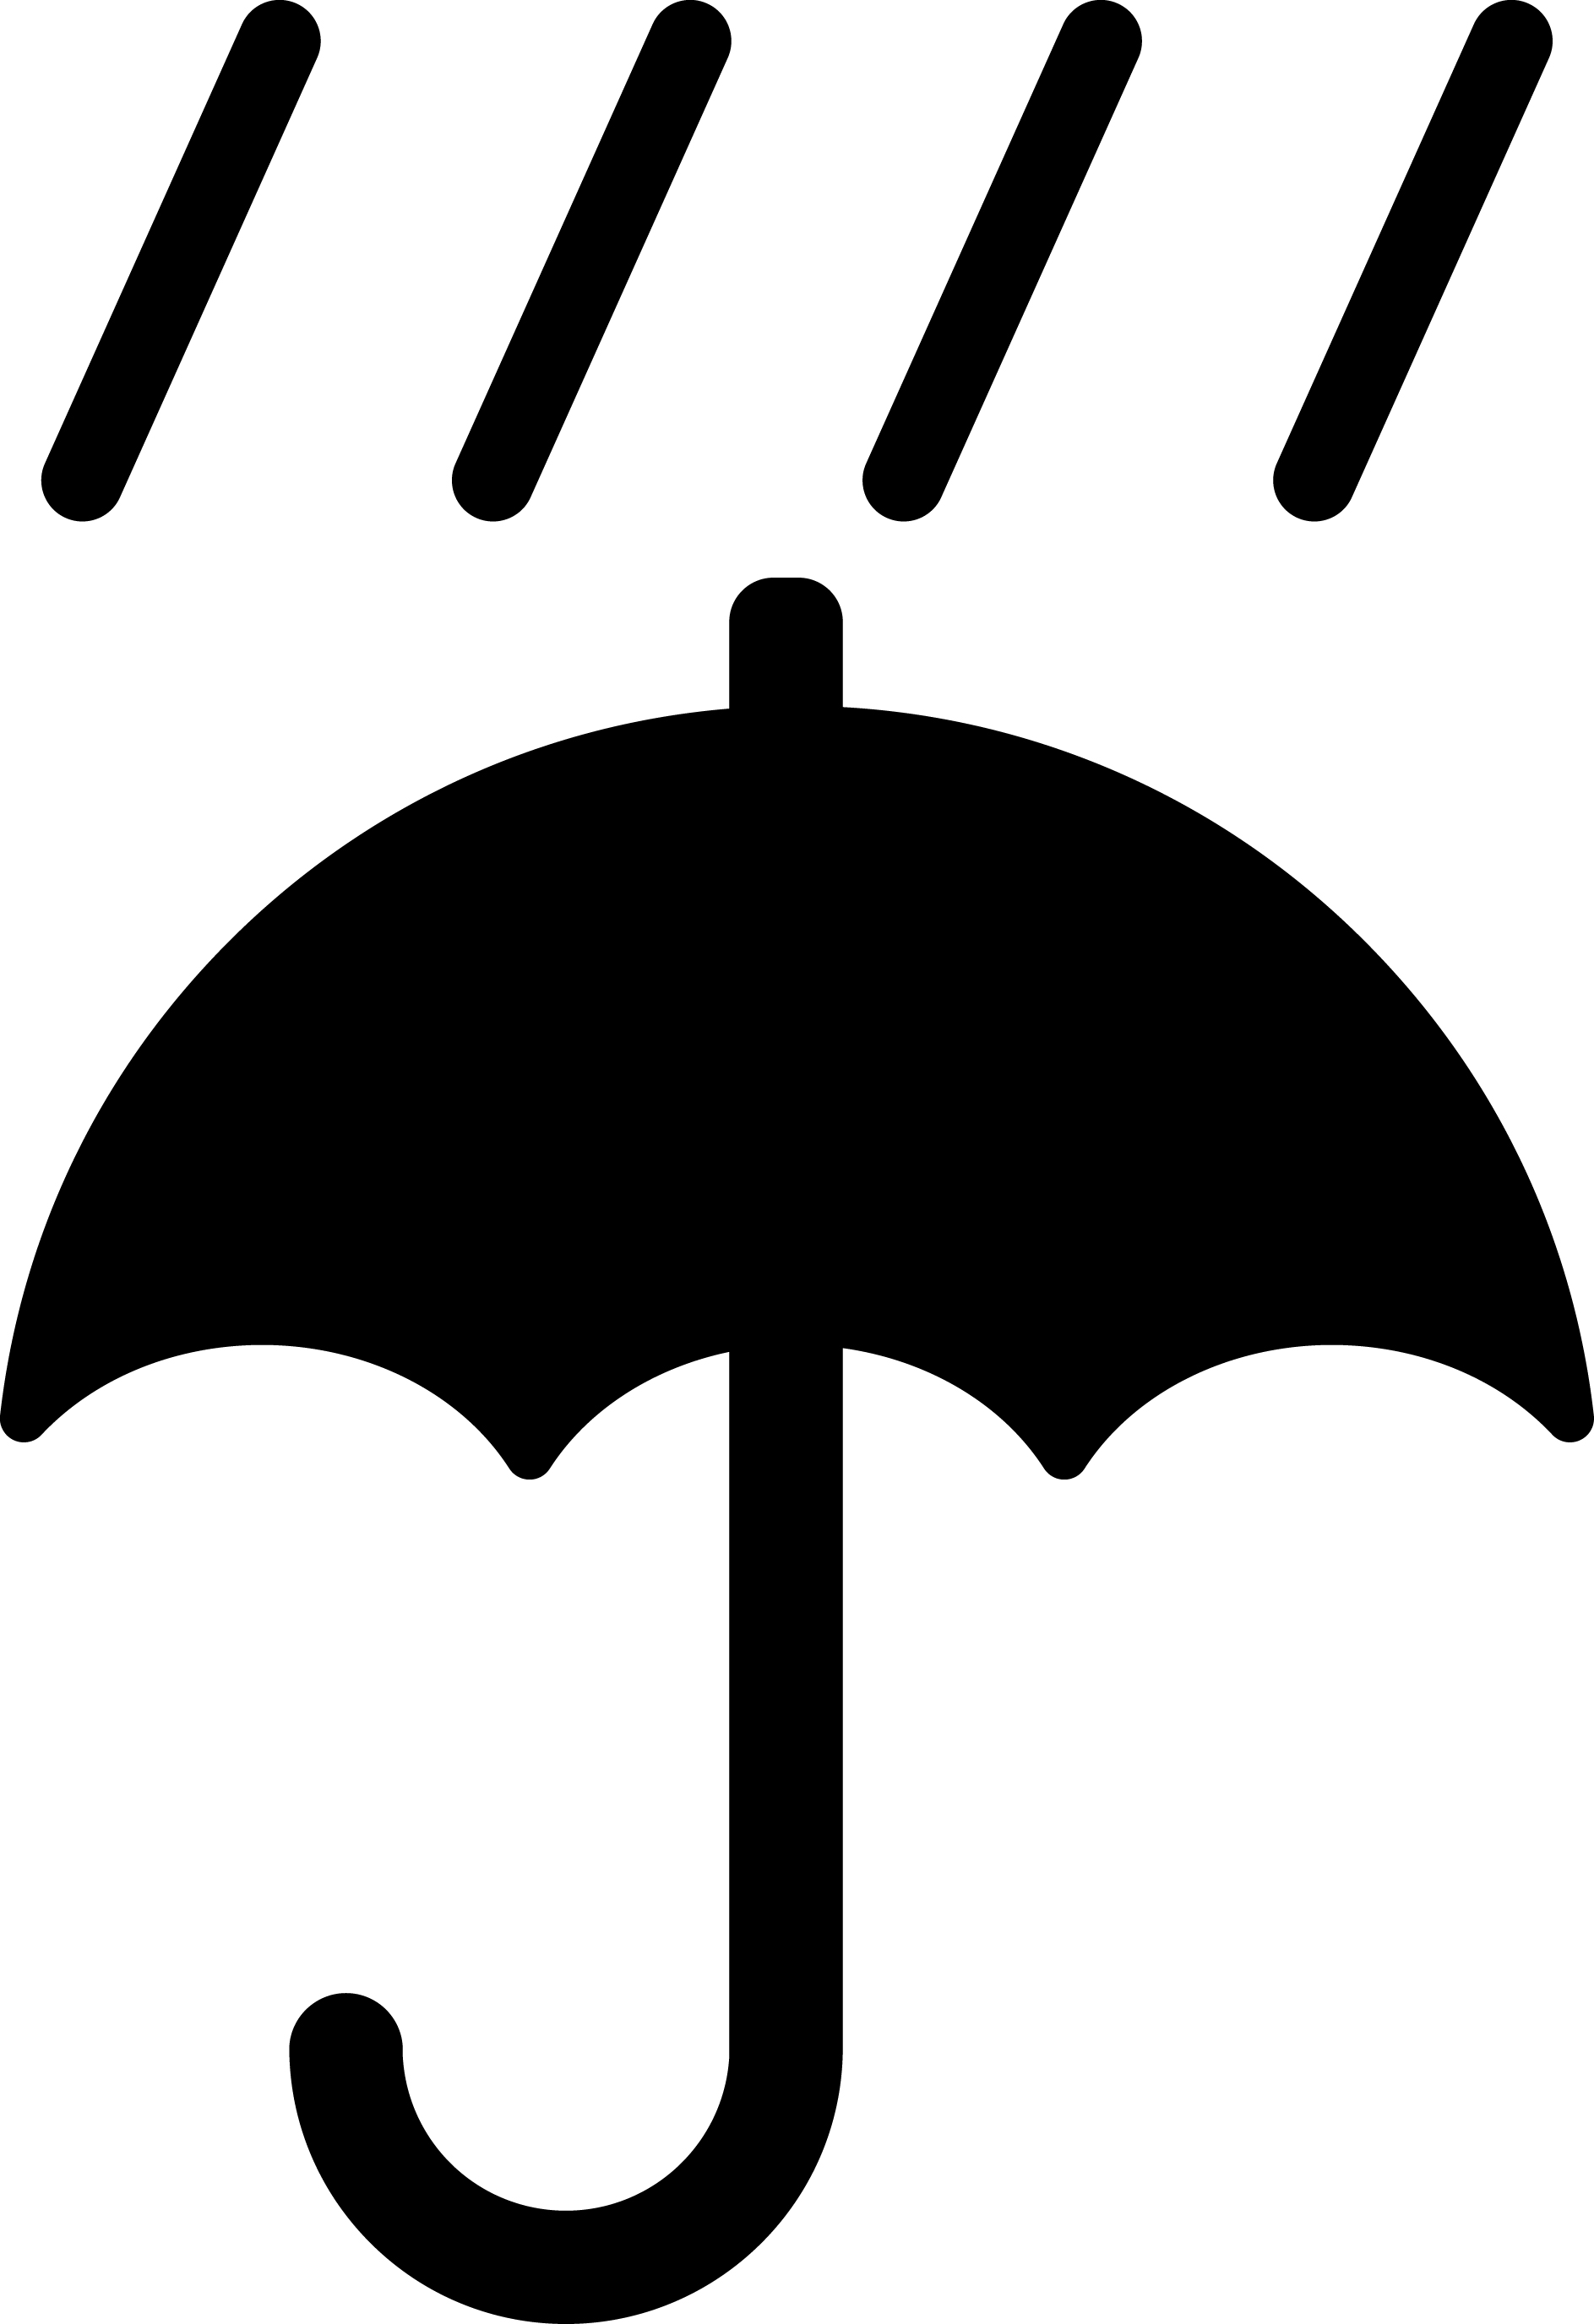 PDF:【重要なお知らせ・台風19号について】